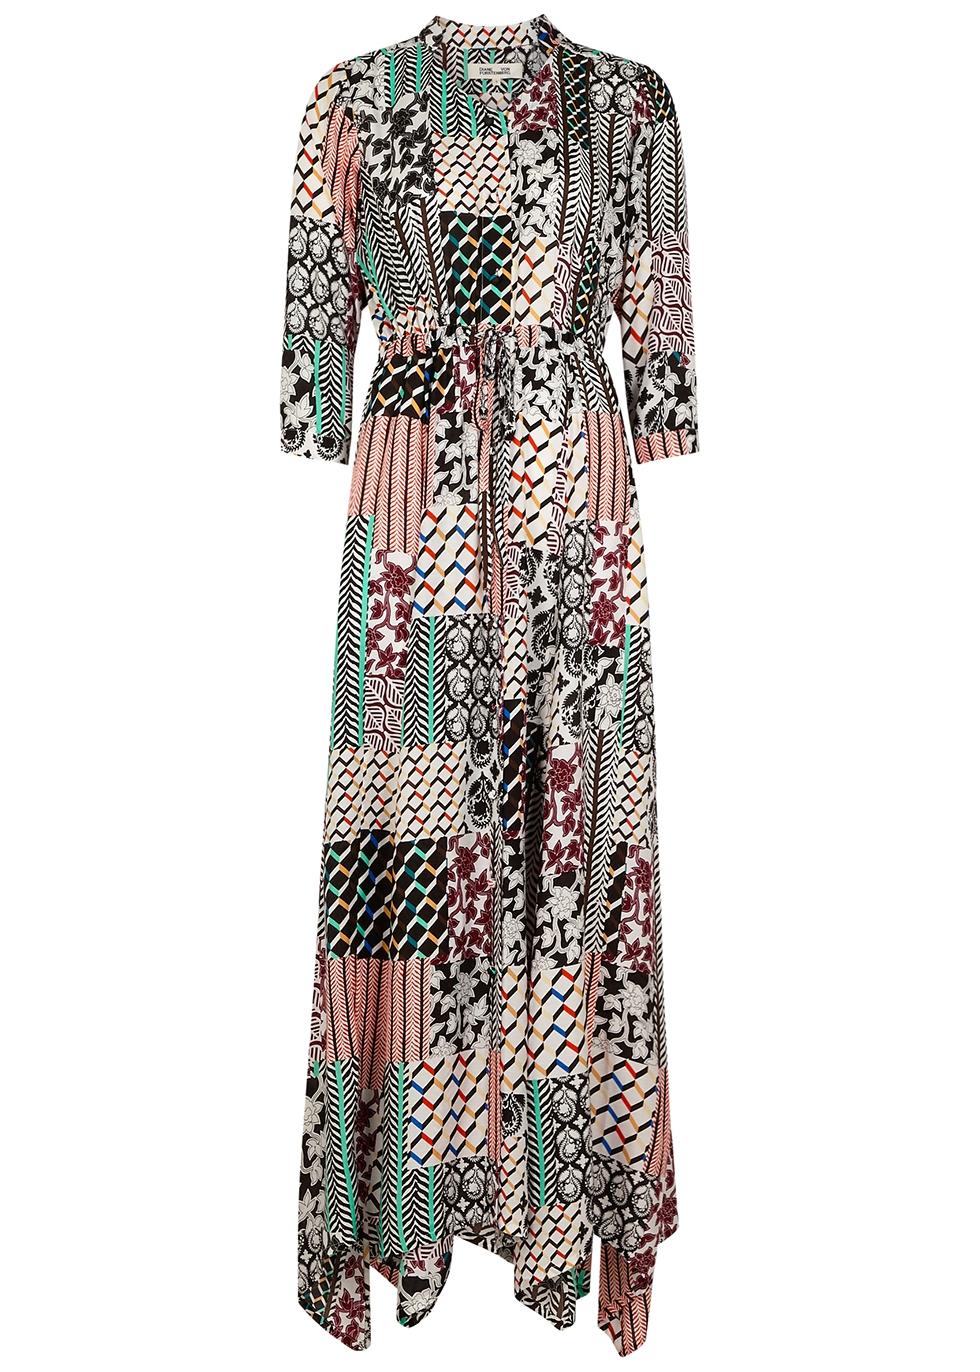 Lily printed maxi dress